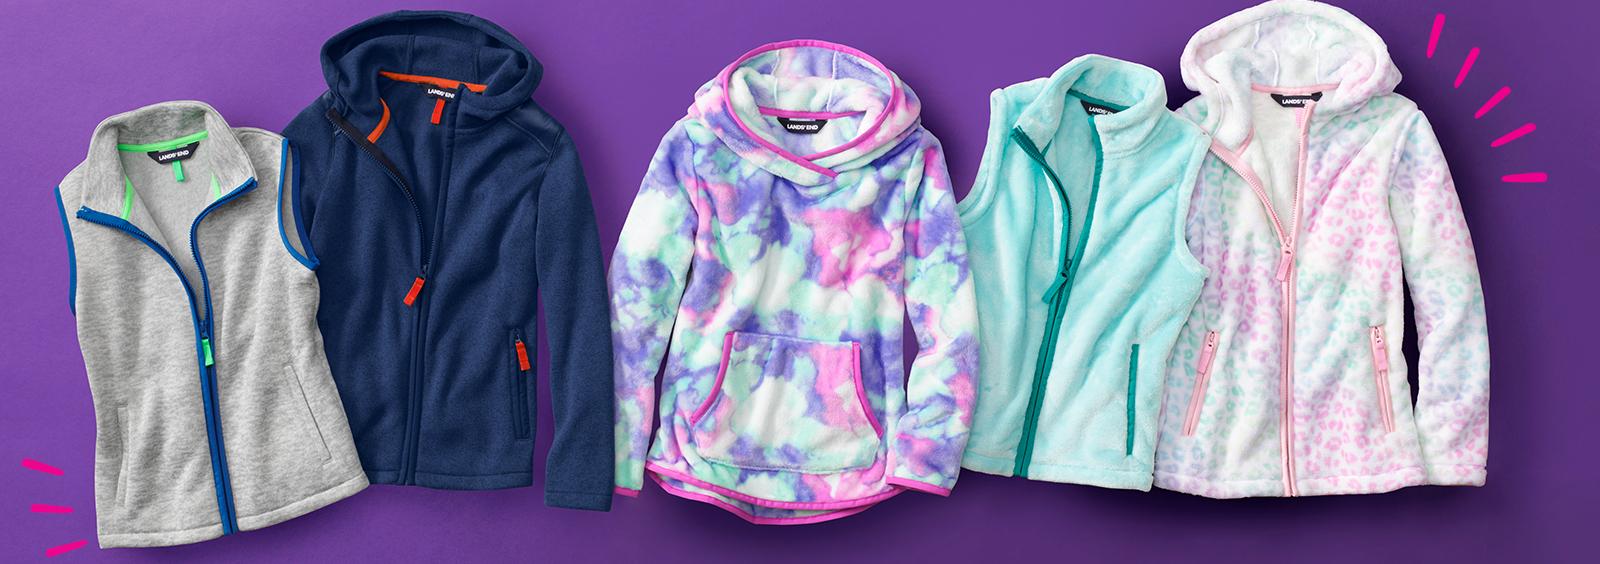 A Guide to Shopping for Girls' Sweatshirts